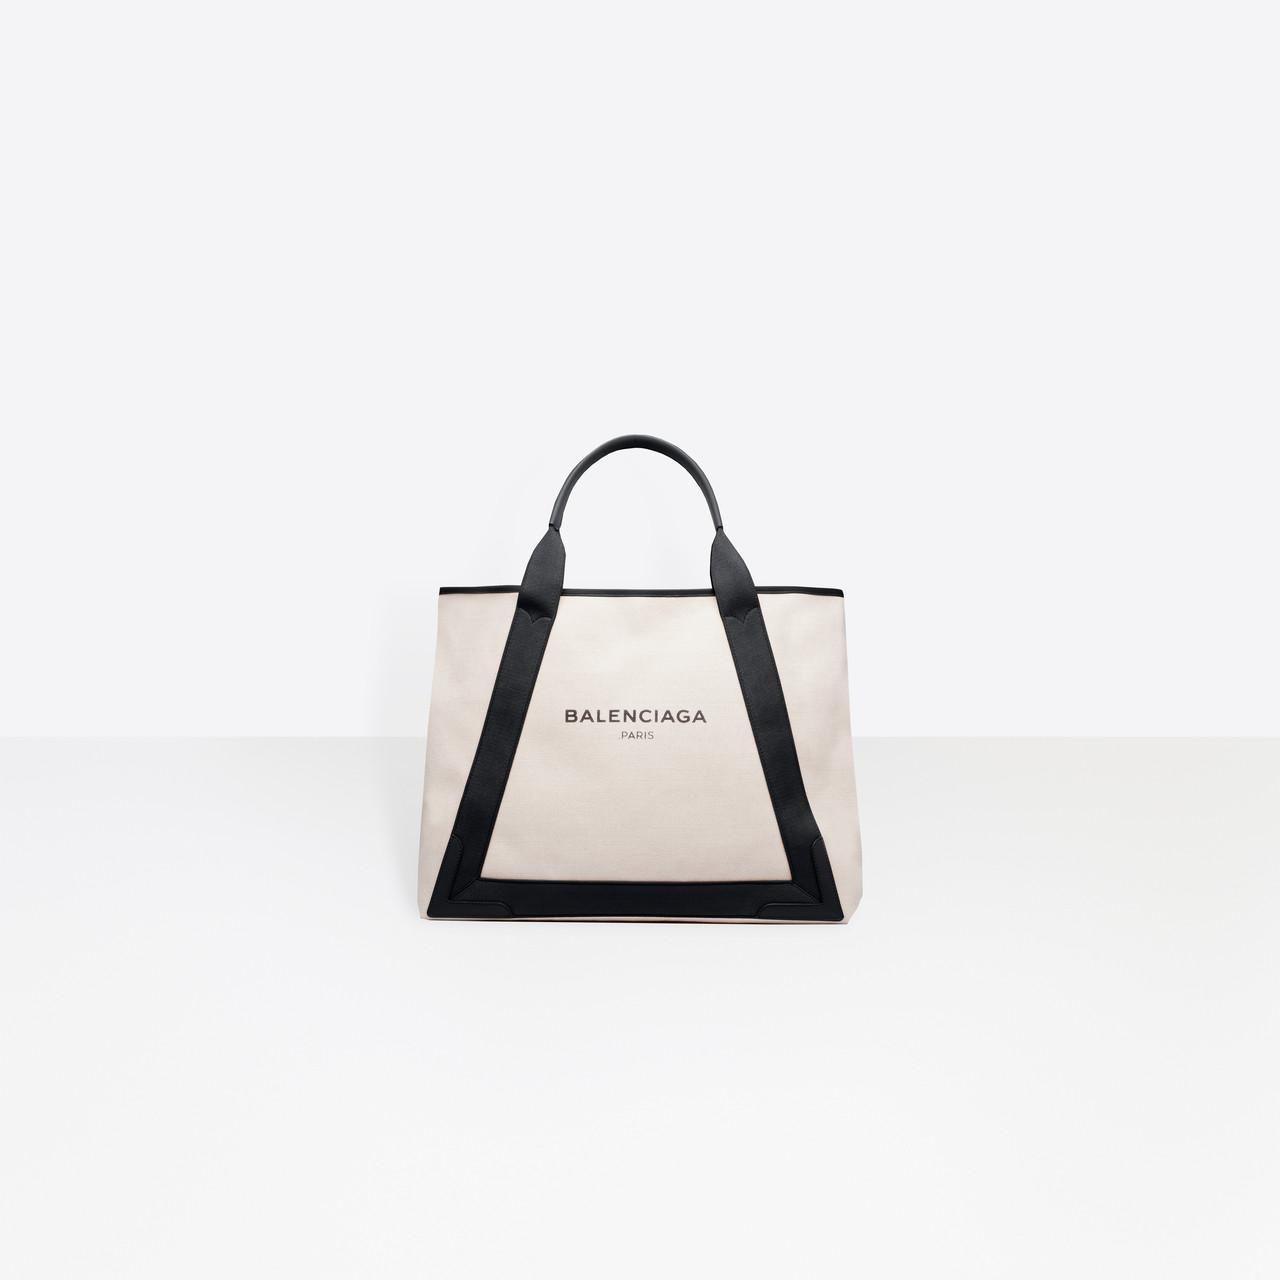 b2c06456d404 Lyst - Balenciaga Ligne Cabas M Cotton-Blend Shopper in White - Save 32%